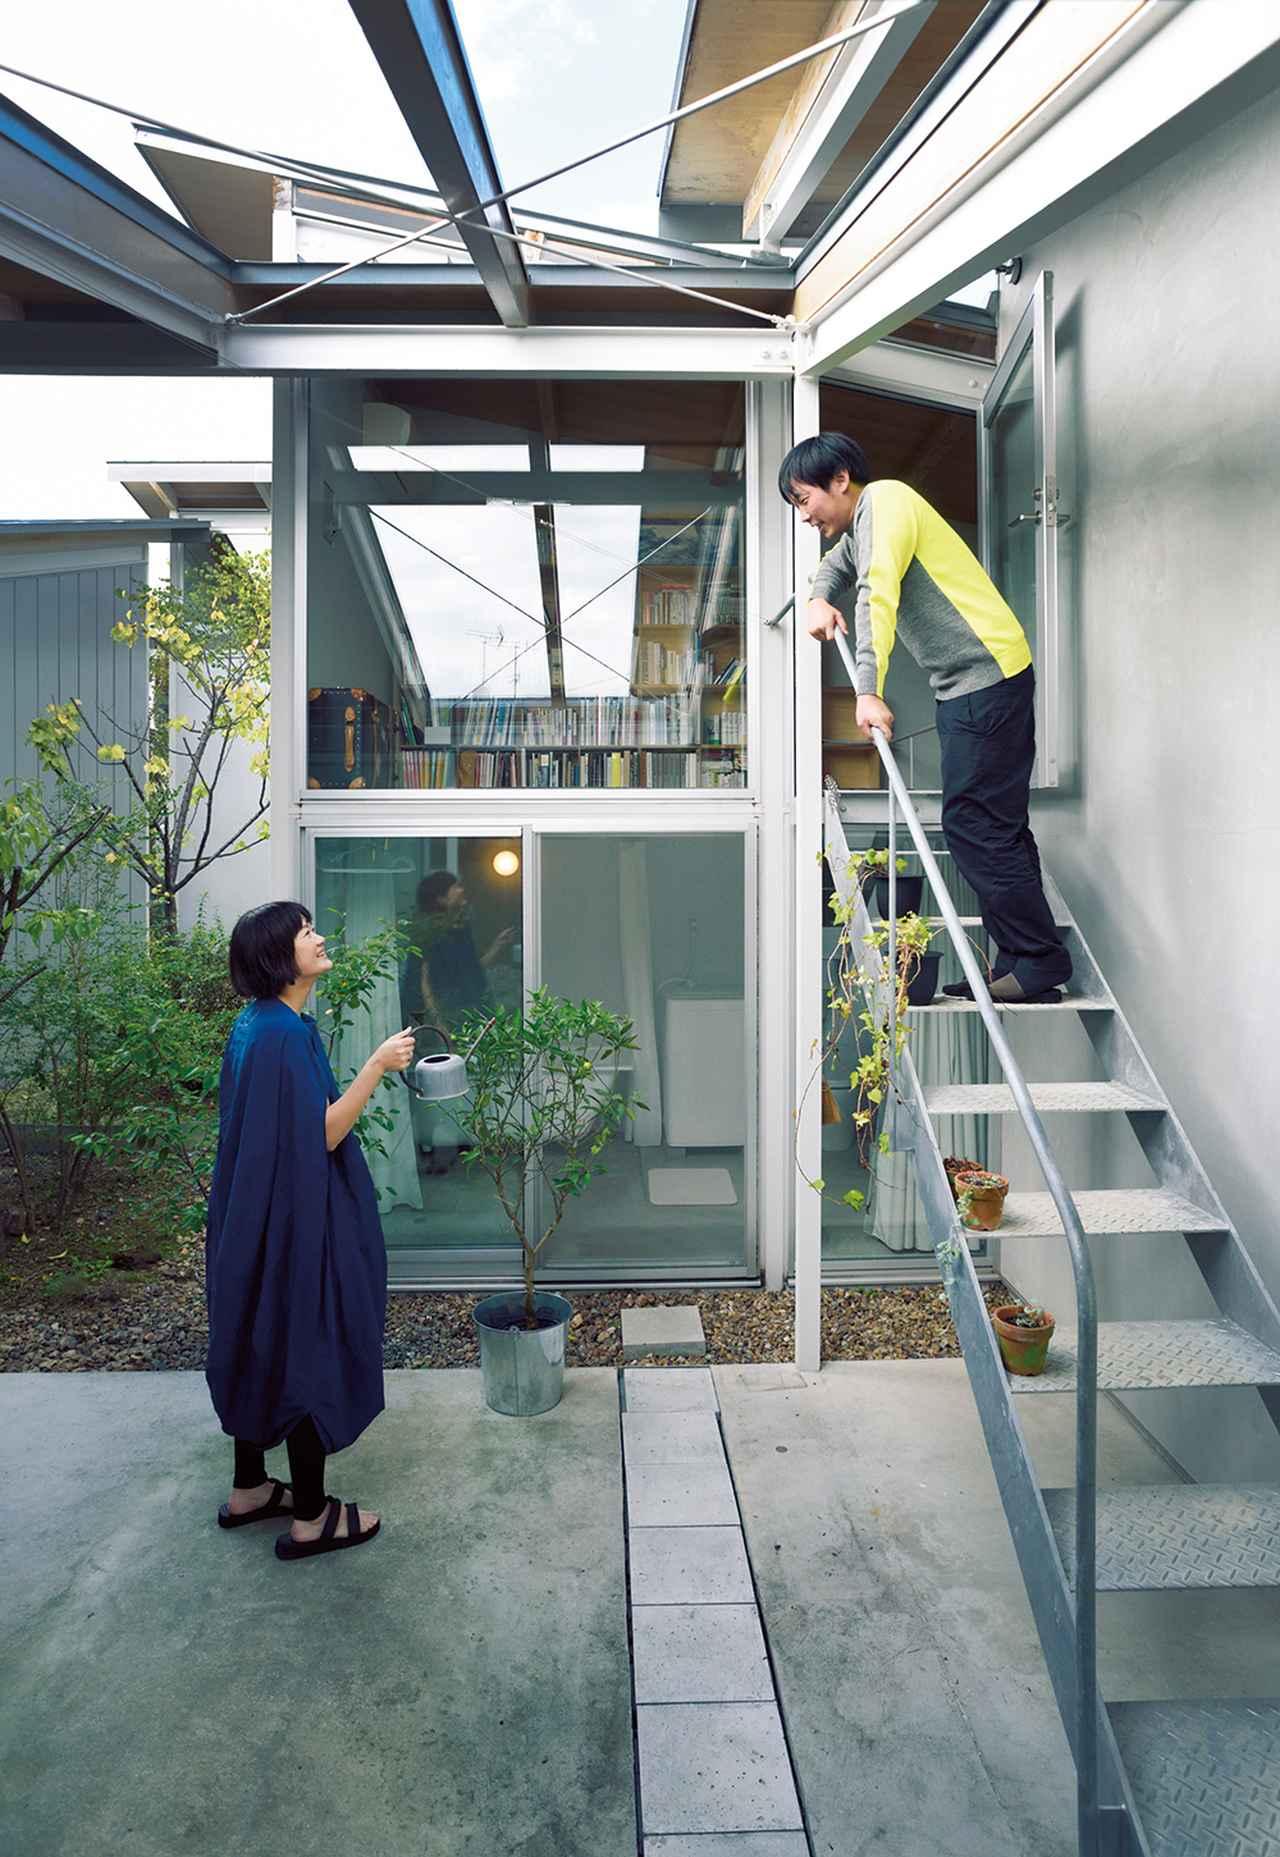 Images : 2番目の画像 - 「「西野山ハウス」の人々が紡ぐ 未来のユートピア」のアルバム - T JAPAN:The New York Times Style Magazine 公式サイト